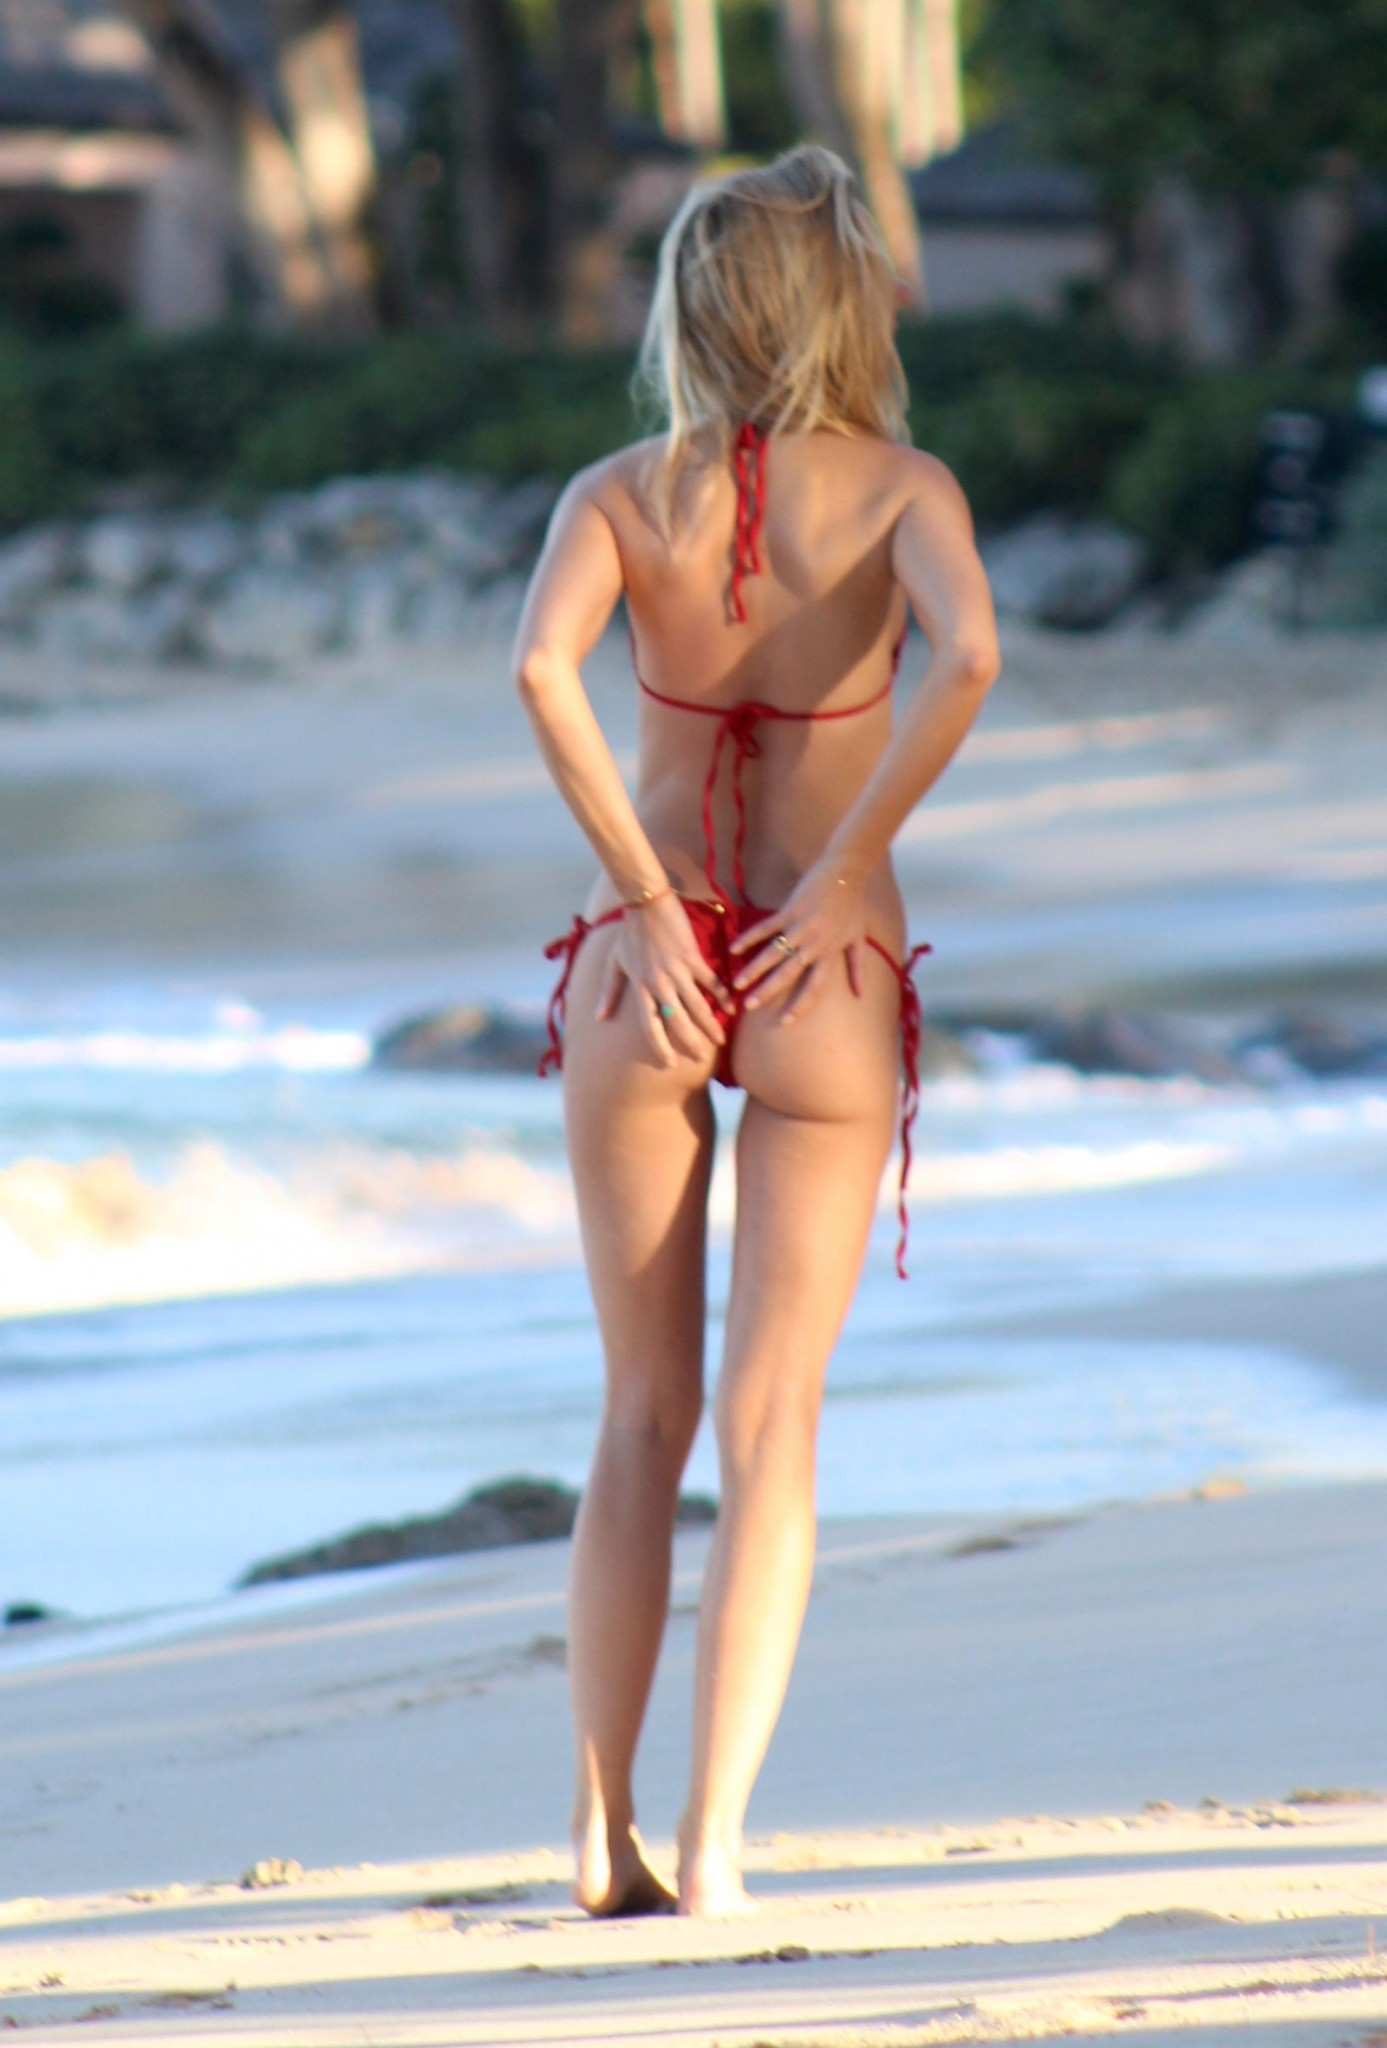 kimberly-garner-superhot-in-tiny-red-bikini-caribbean-11